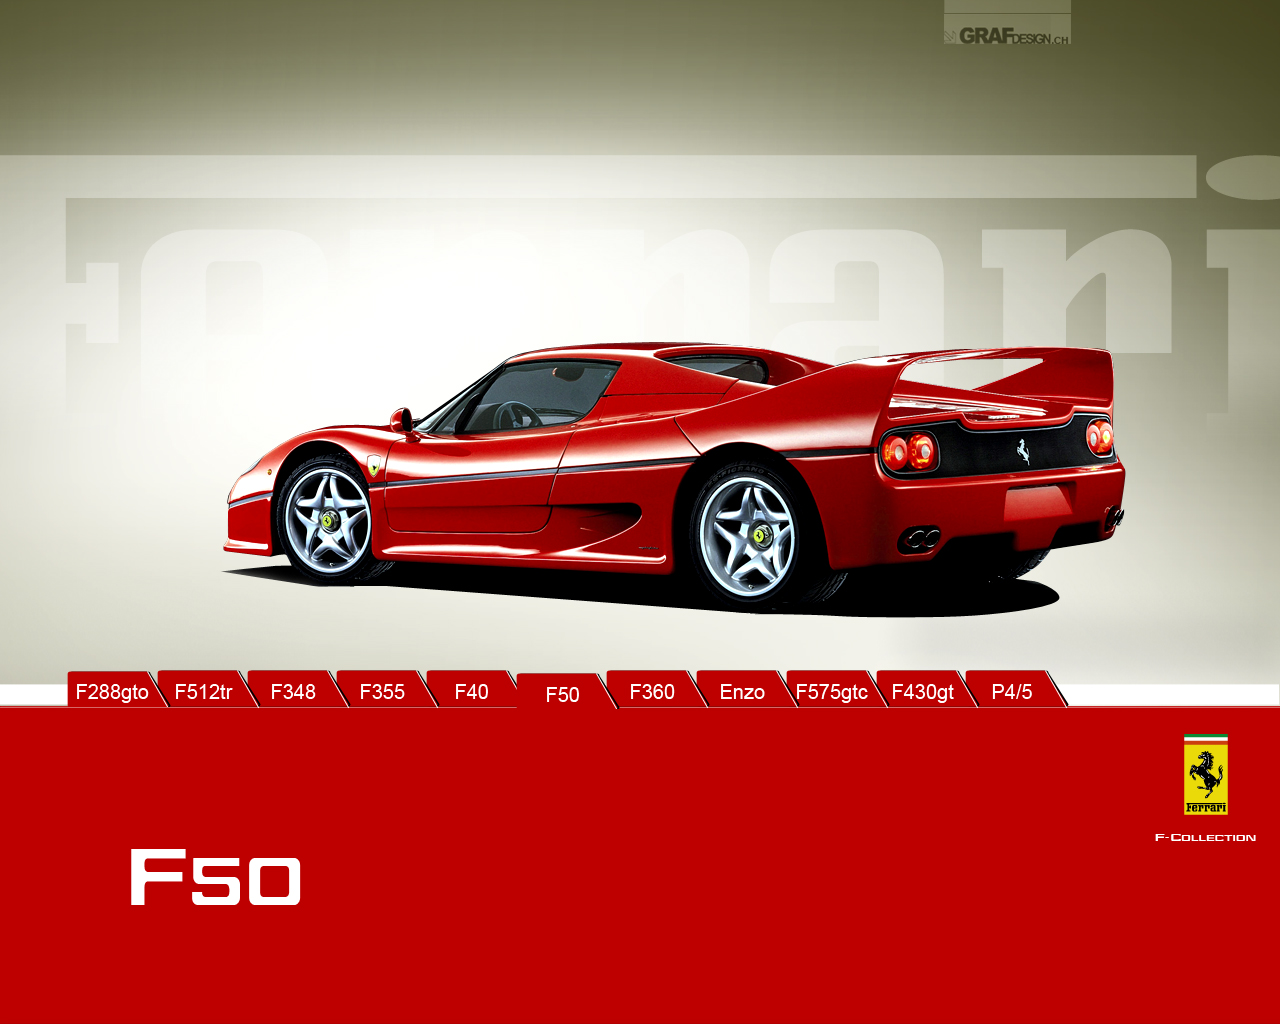 ferrari f50 engine  ferrari  free engine image for user